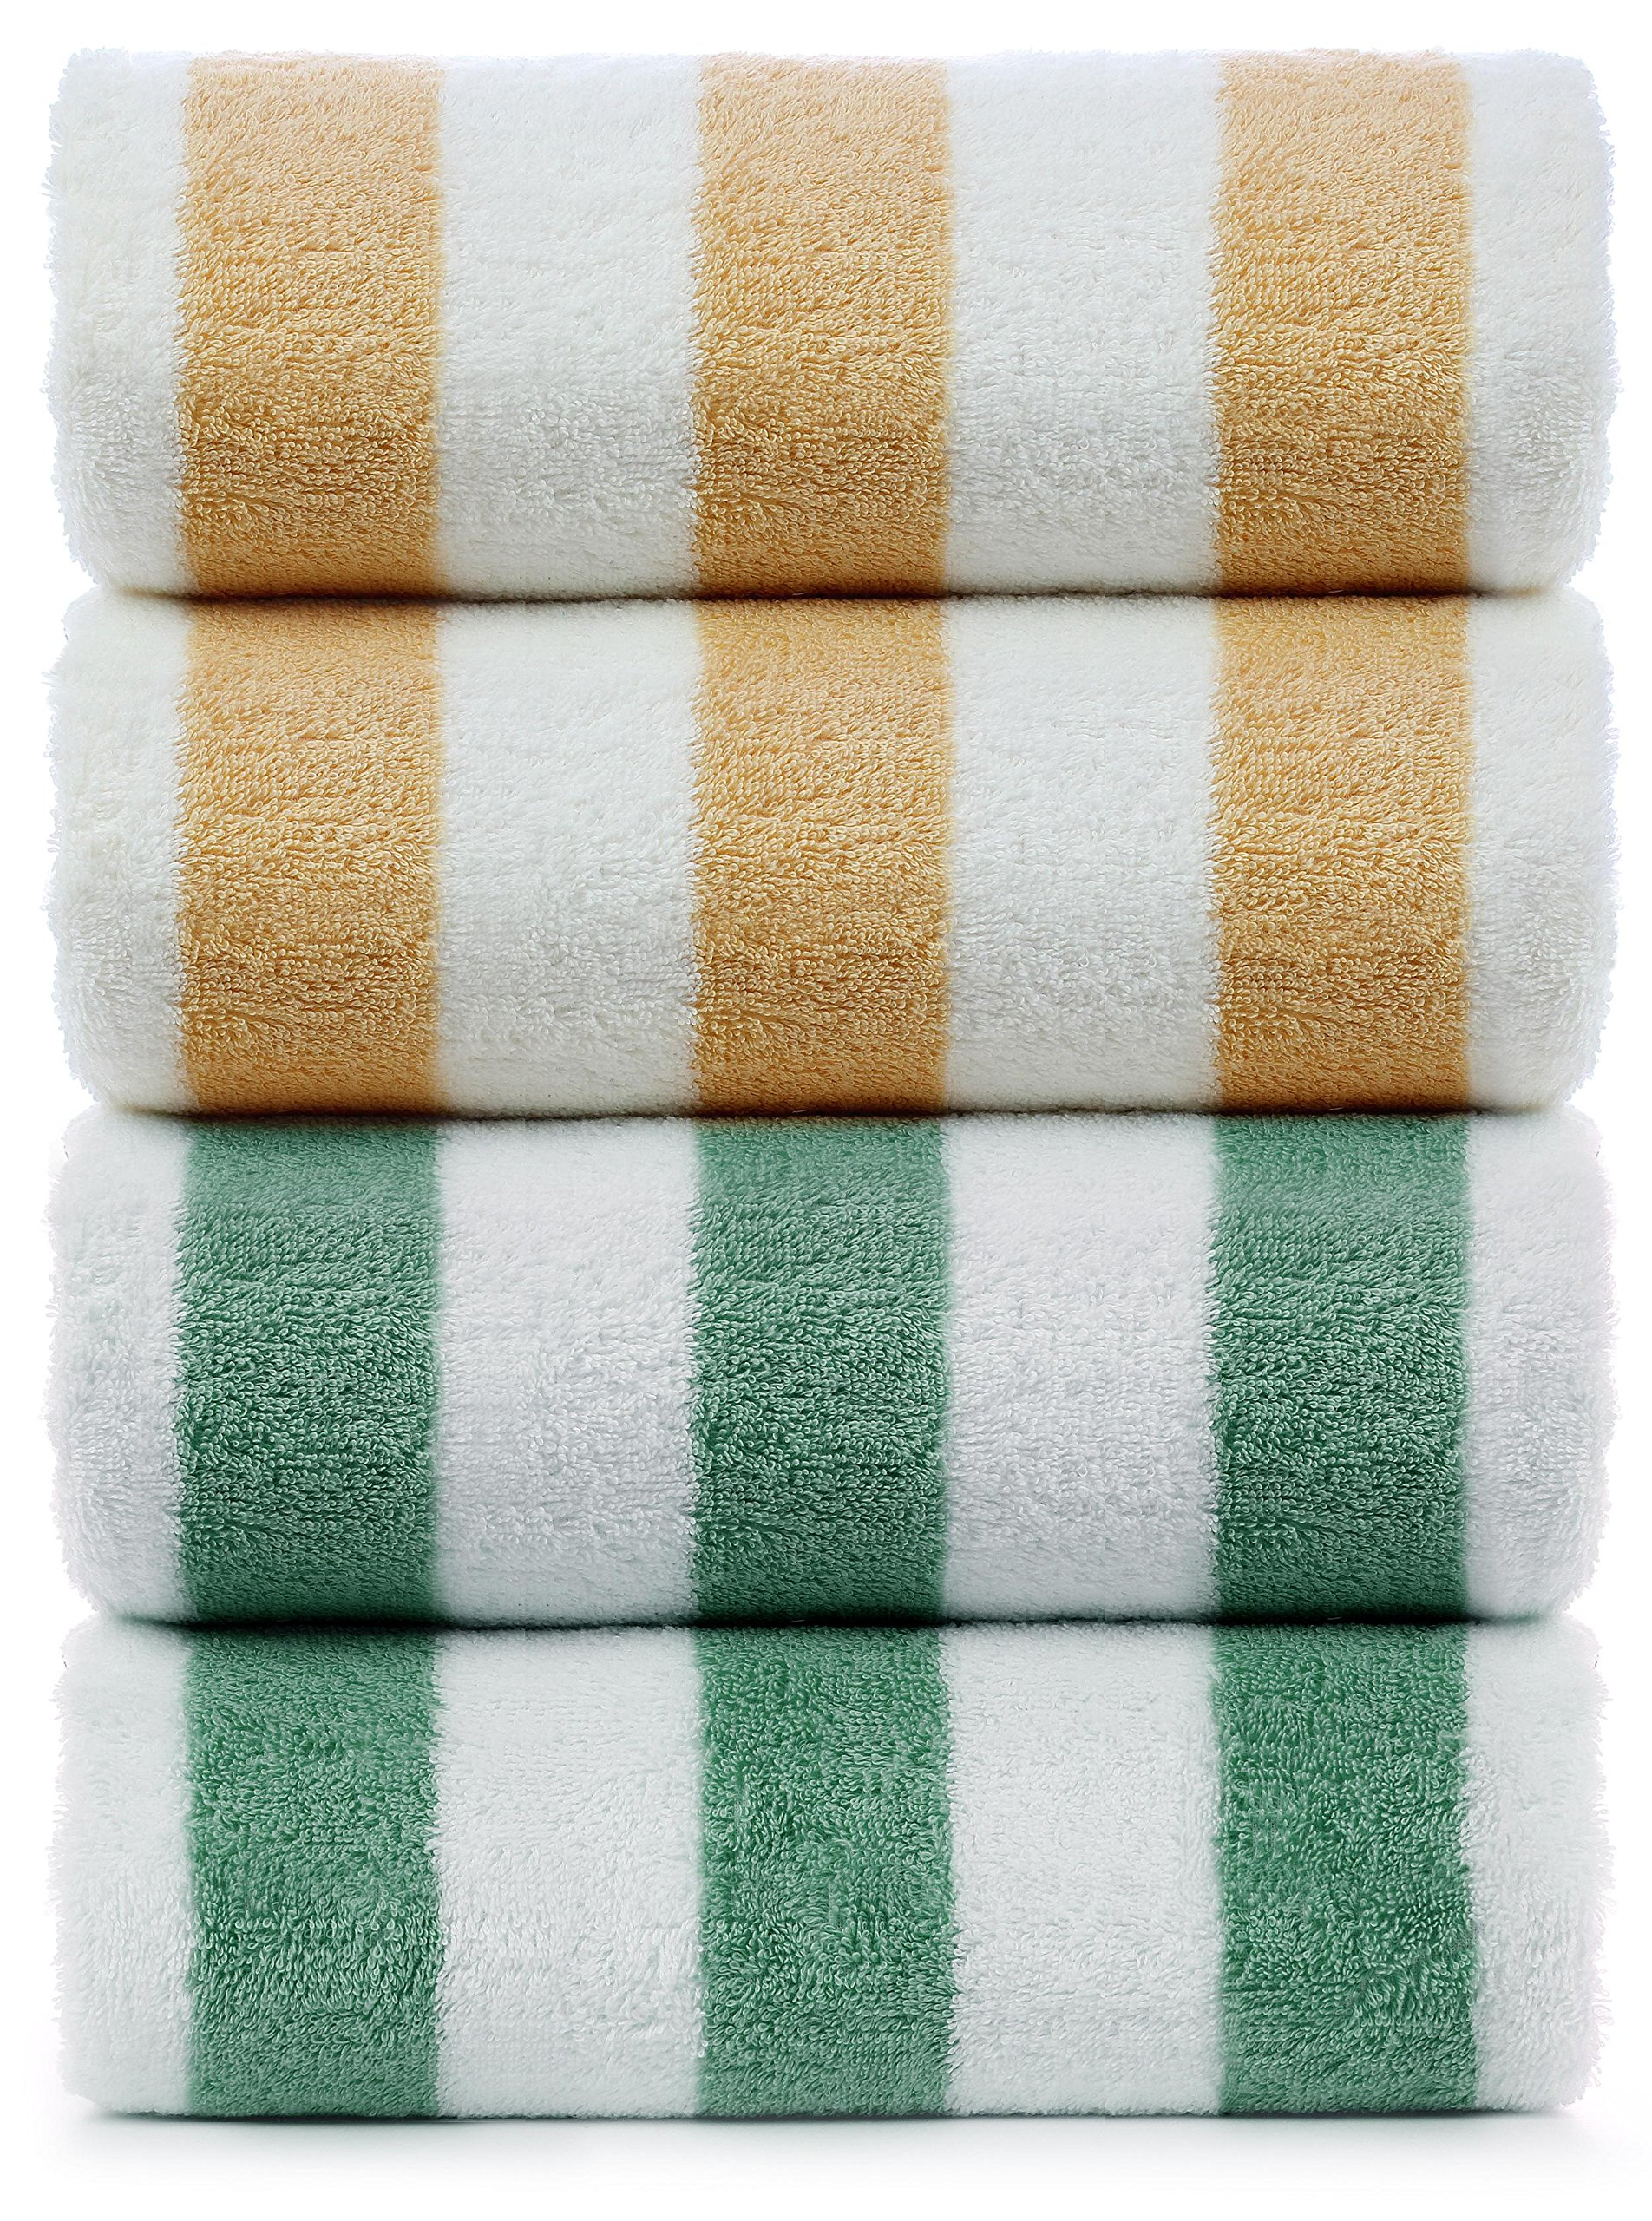 INDULGE Large Beach and Pool Towel, Cabana Stripe, 100% Turkish Cotton (30x60 inches, Set of 4, Salmon + Green)